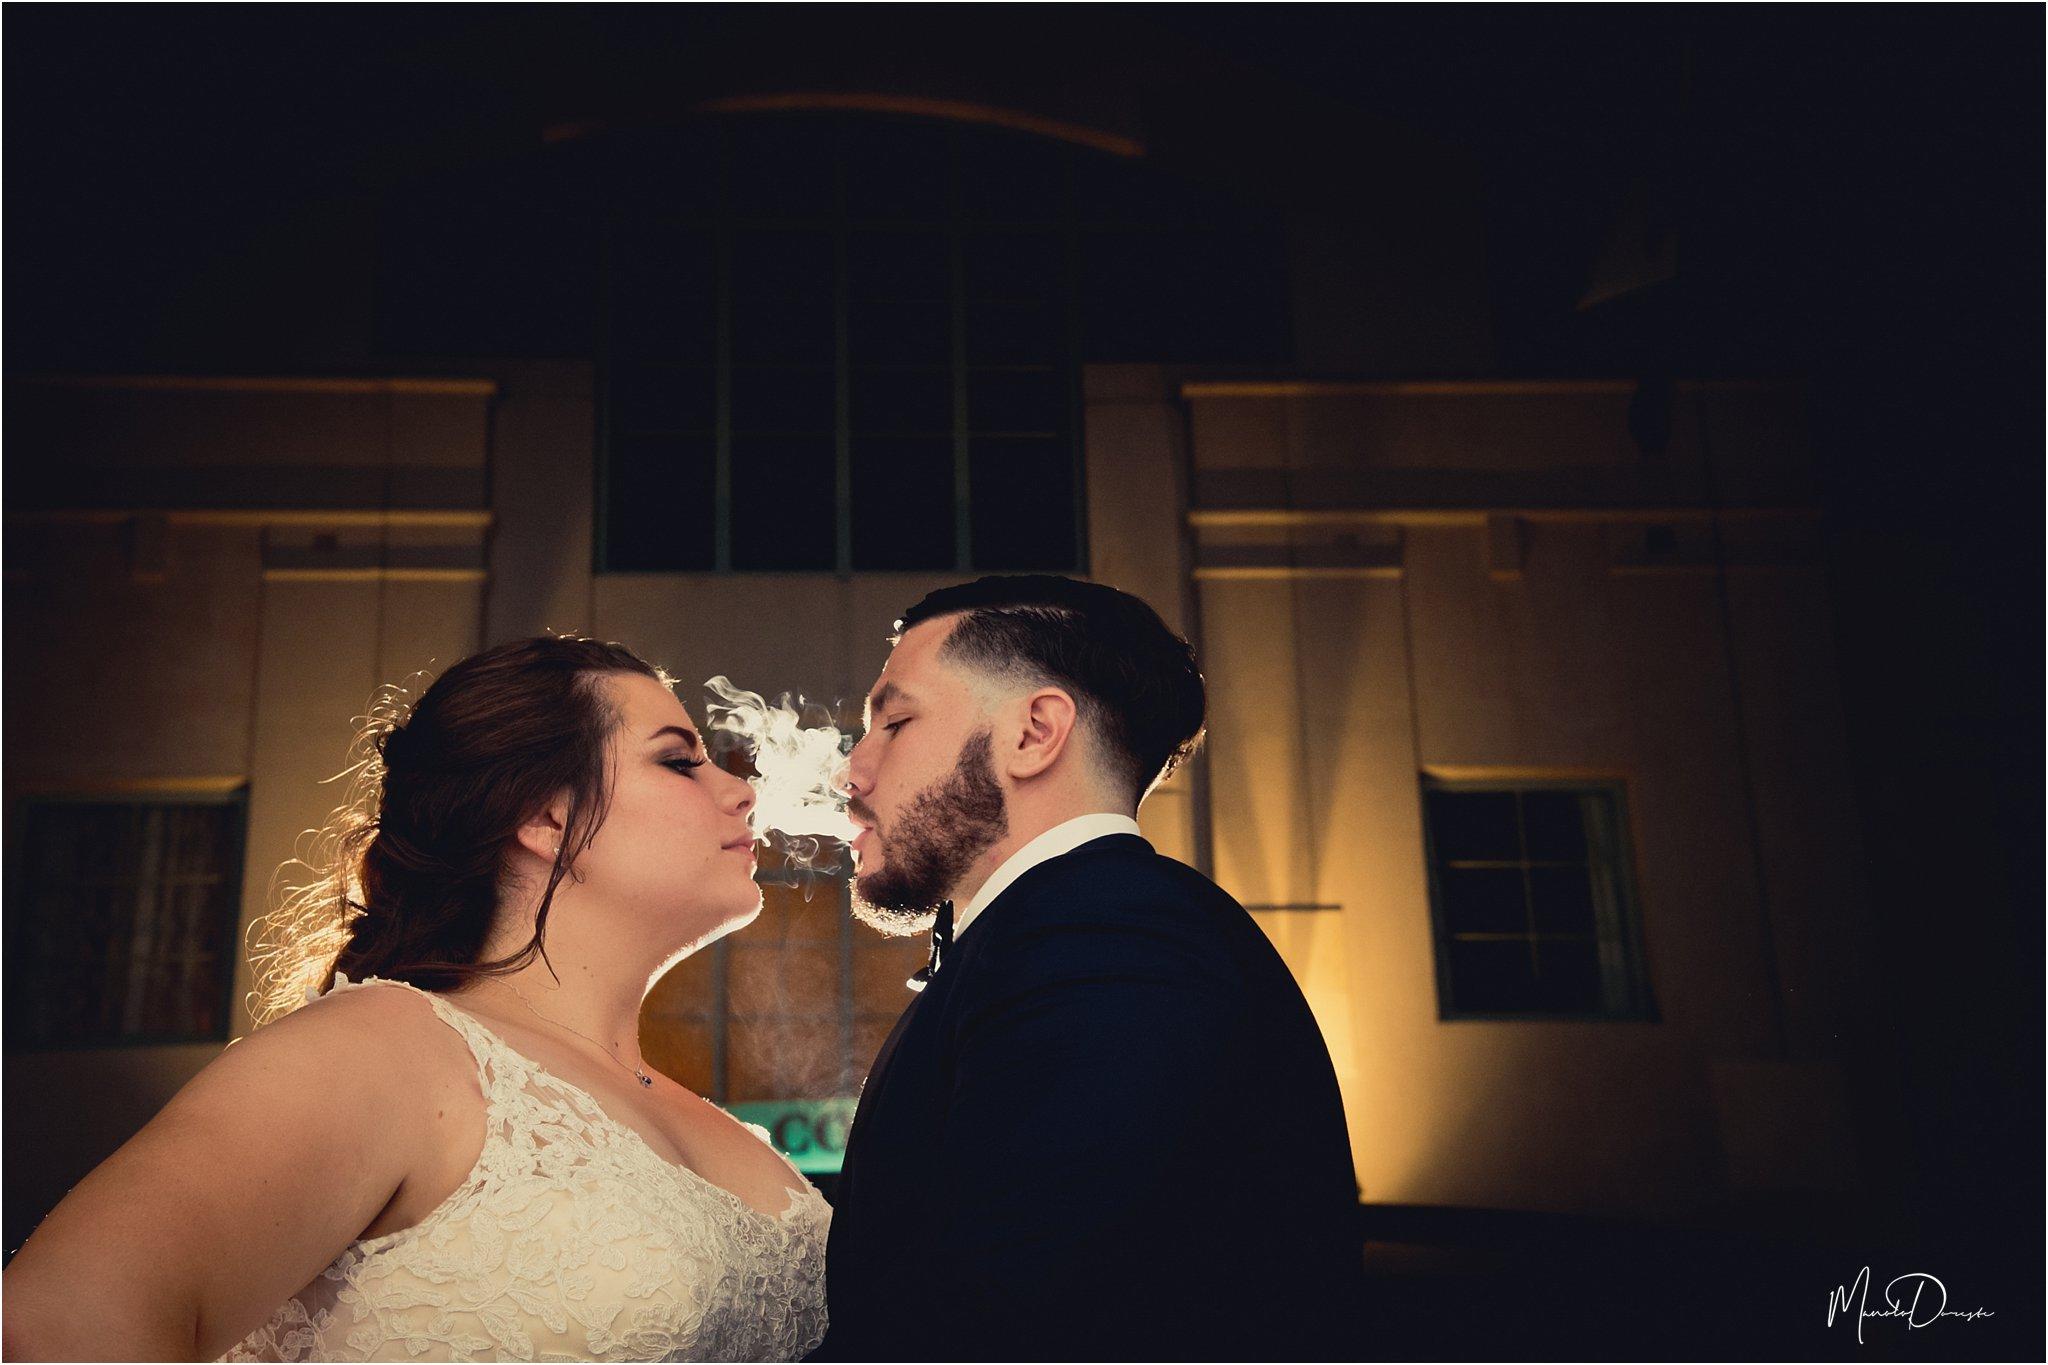 0379_ManoloDoreste_InFocusStudios_Wedding_Family_Photography_Miami_MiamiPhotographer.jpg